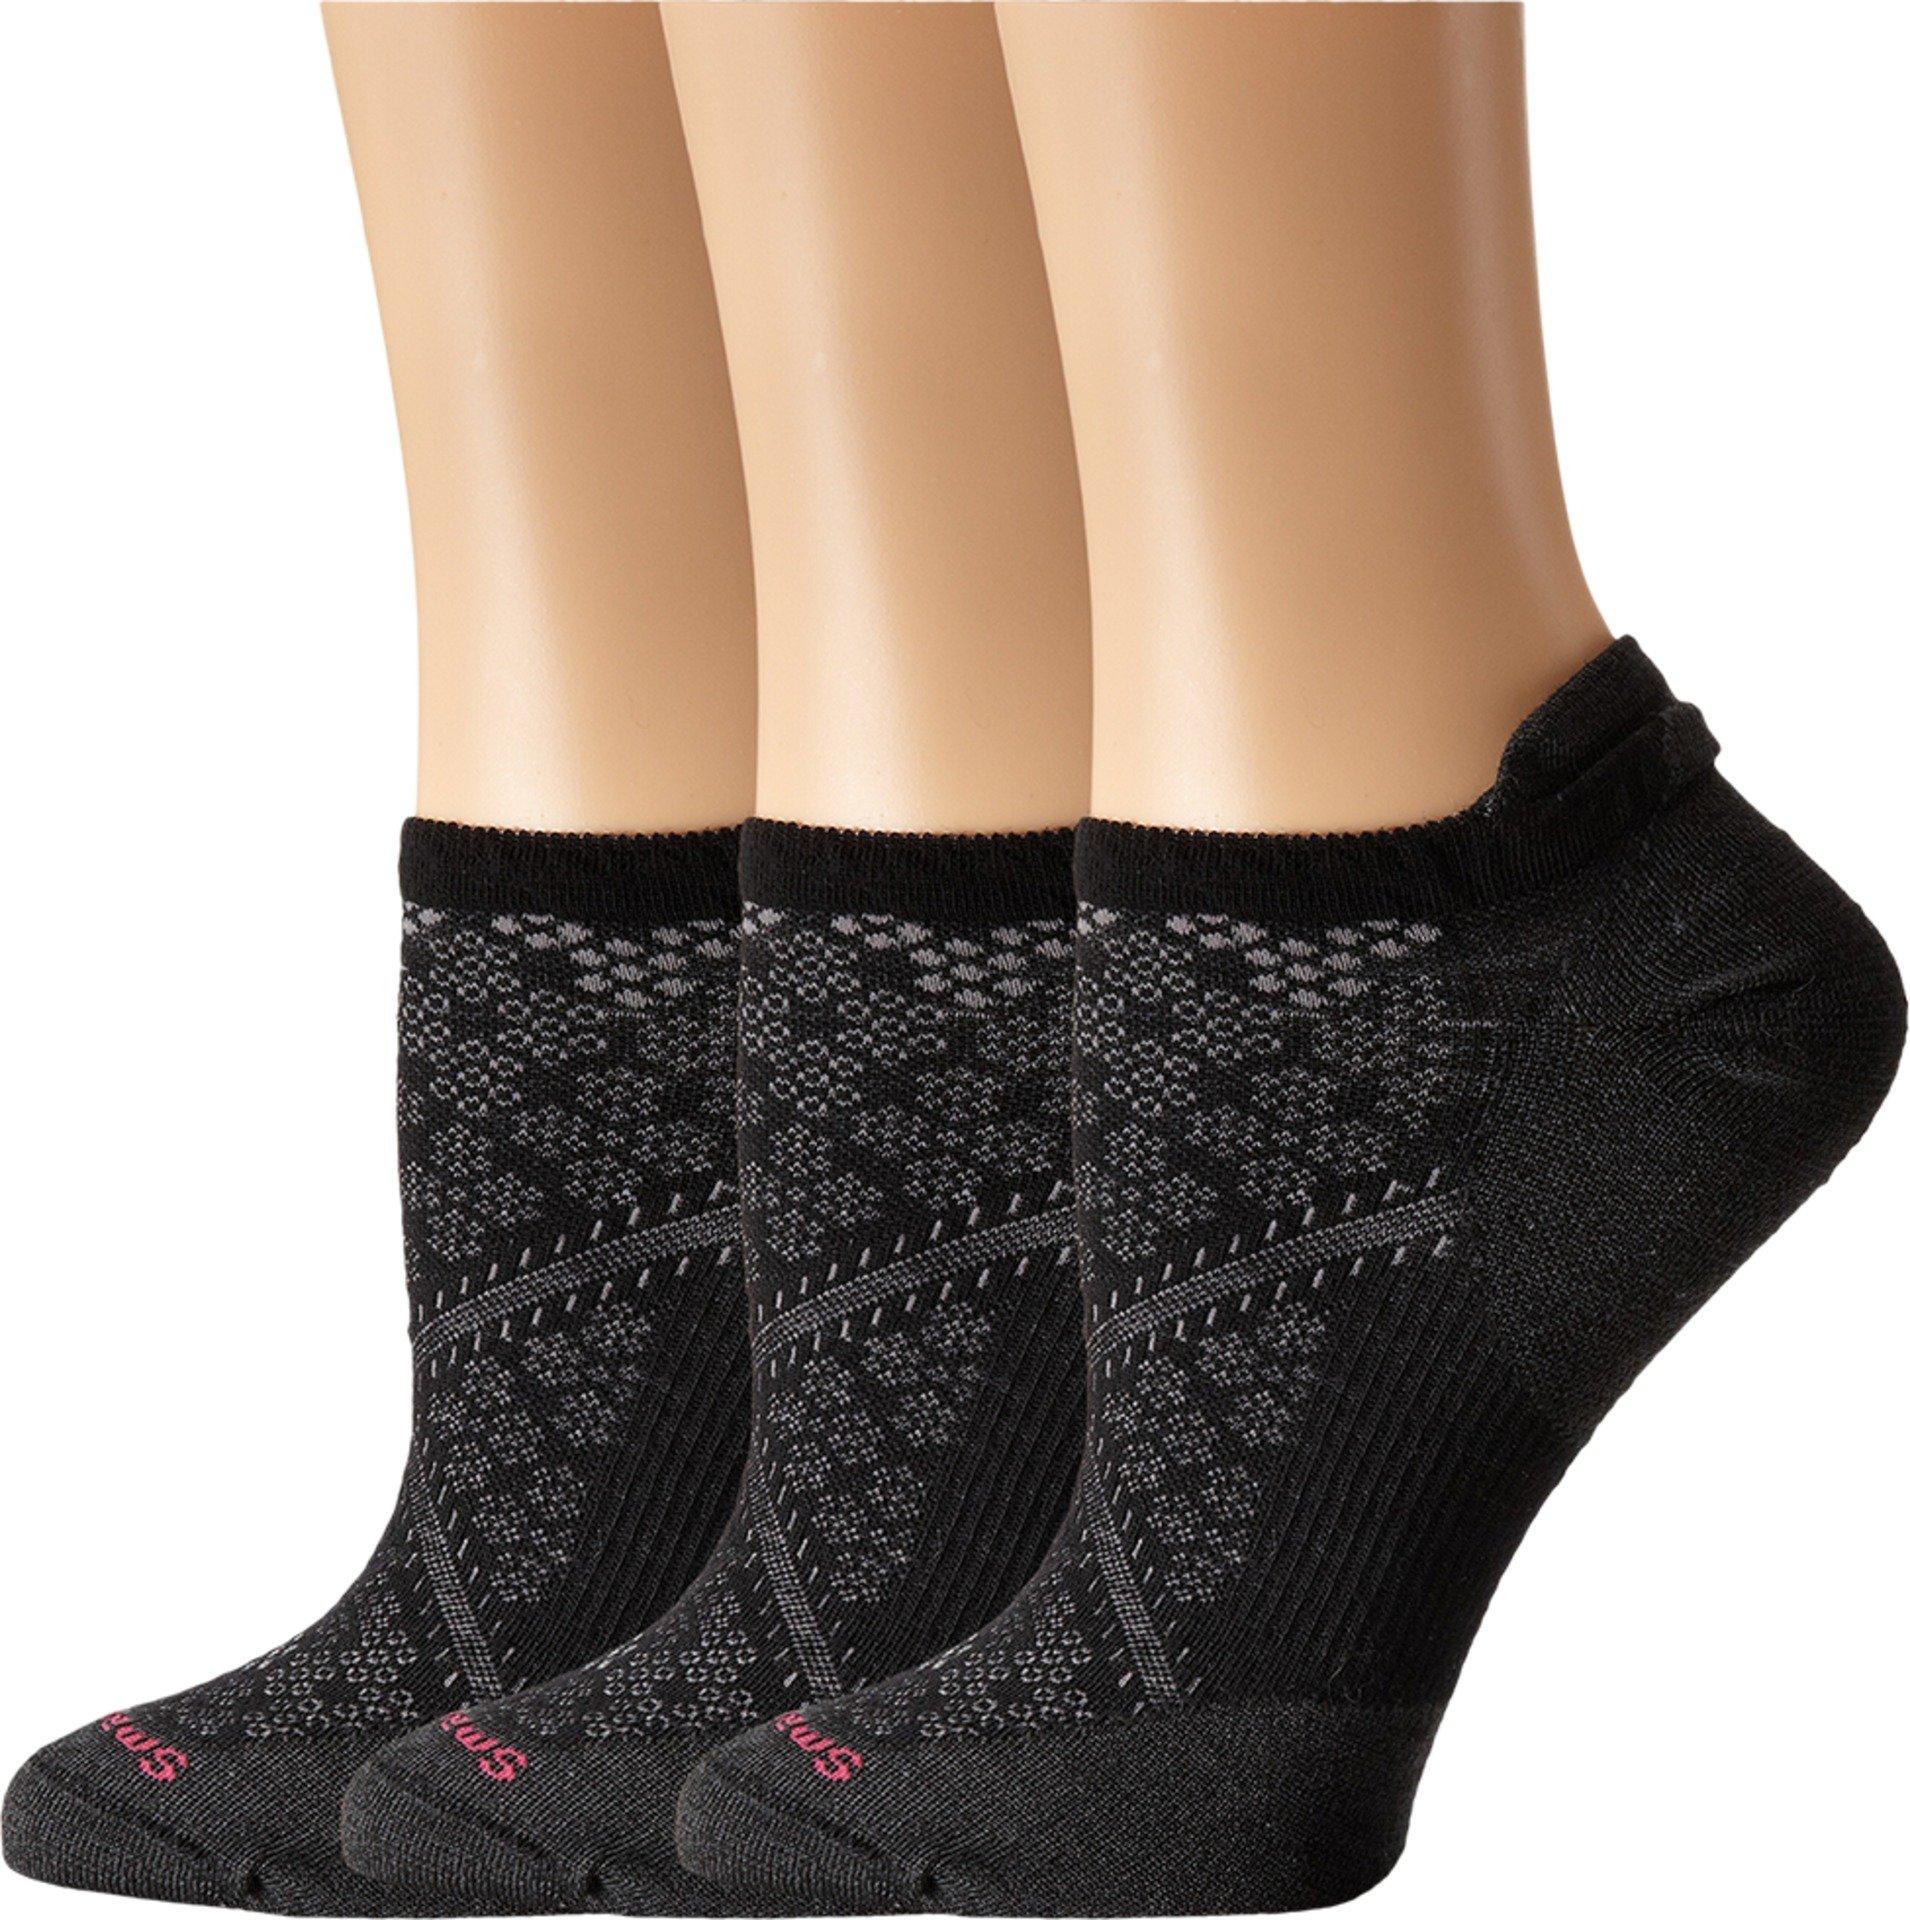 Smartwool Women's PhD Run Ultra Light Micro 3-Pair Pack Black Socks MD (Women's Shoe 7-9.5)